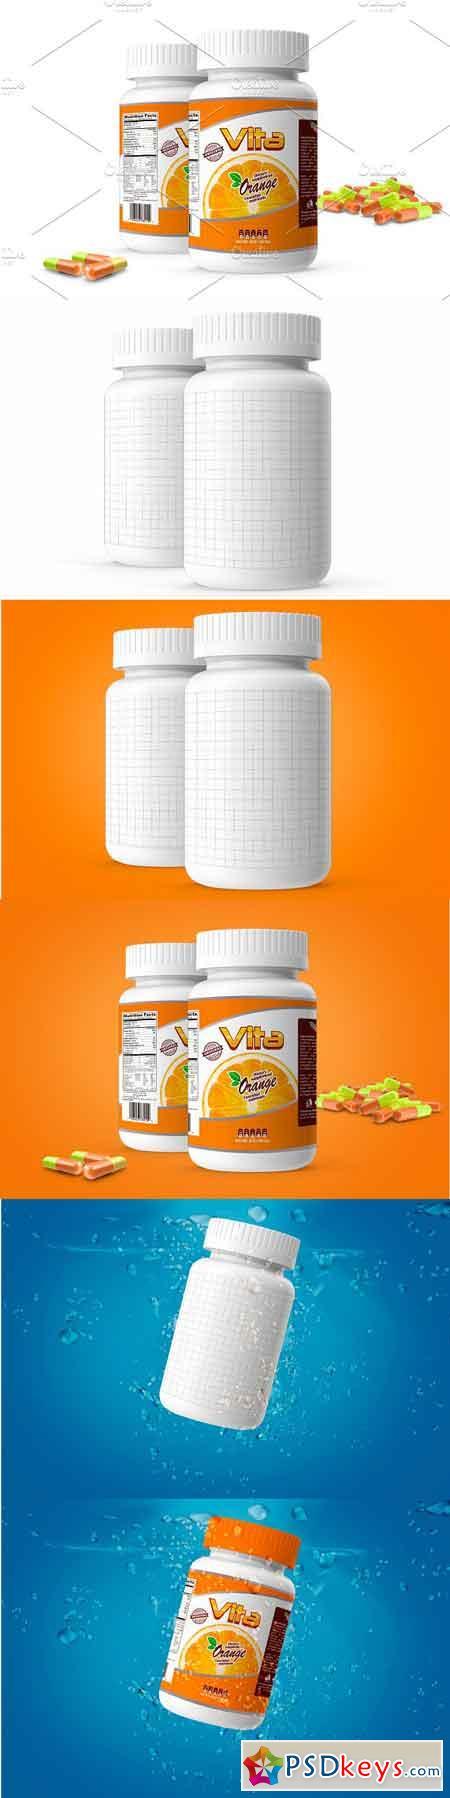 Pills Botle Vitamin 3087467